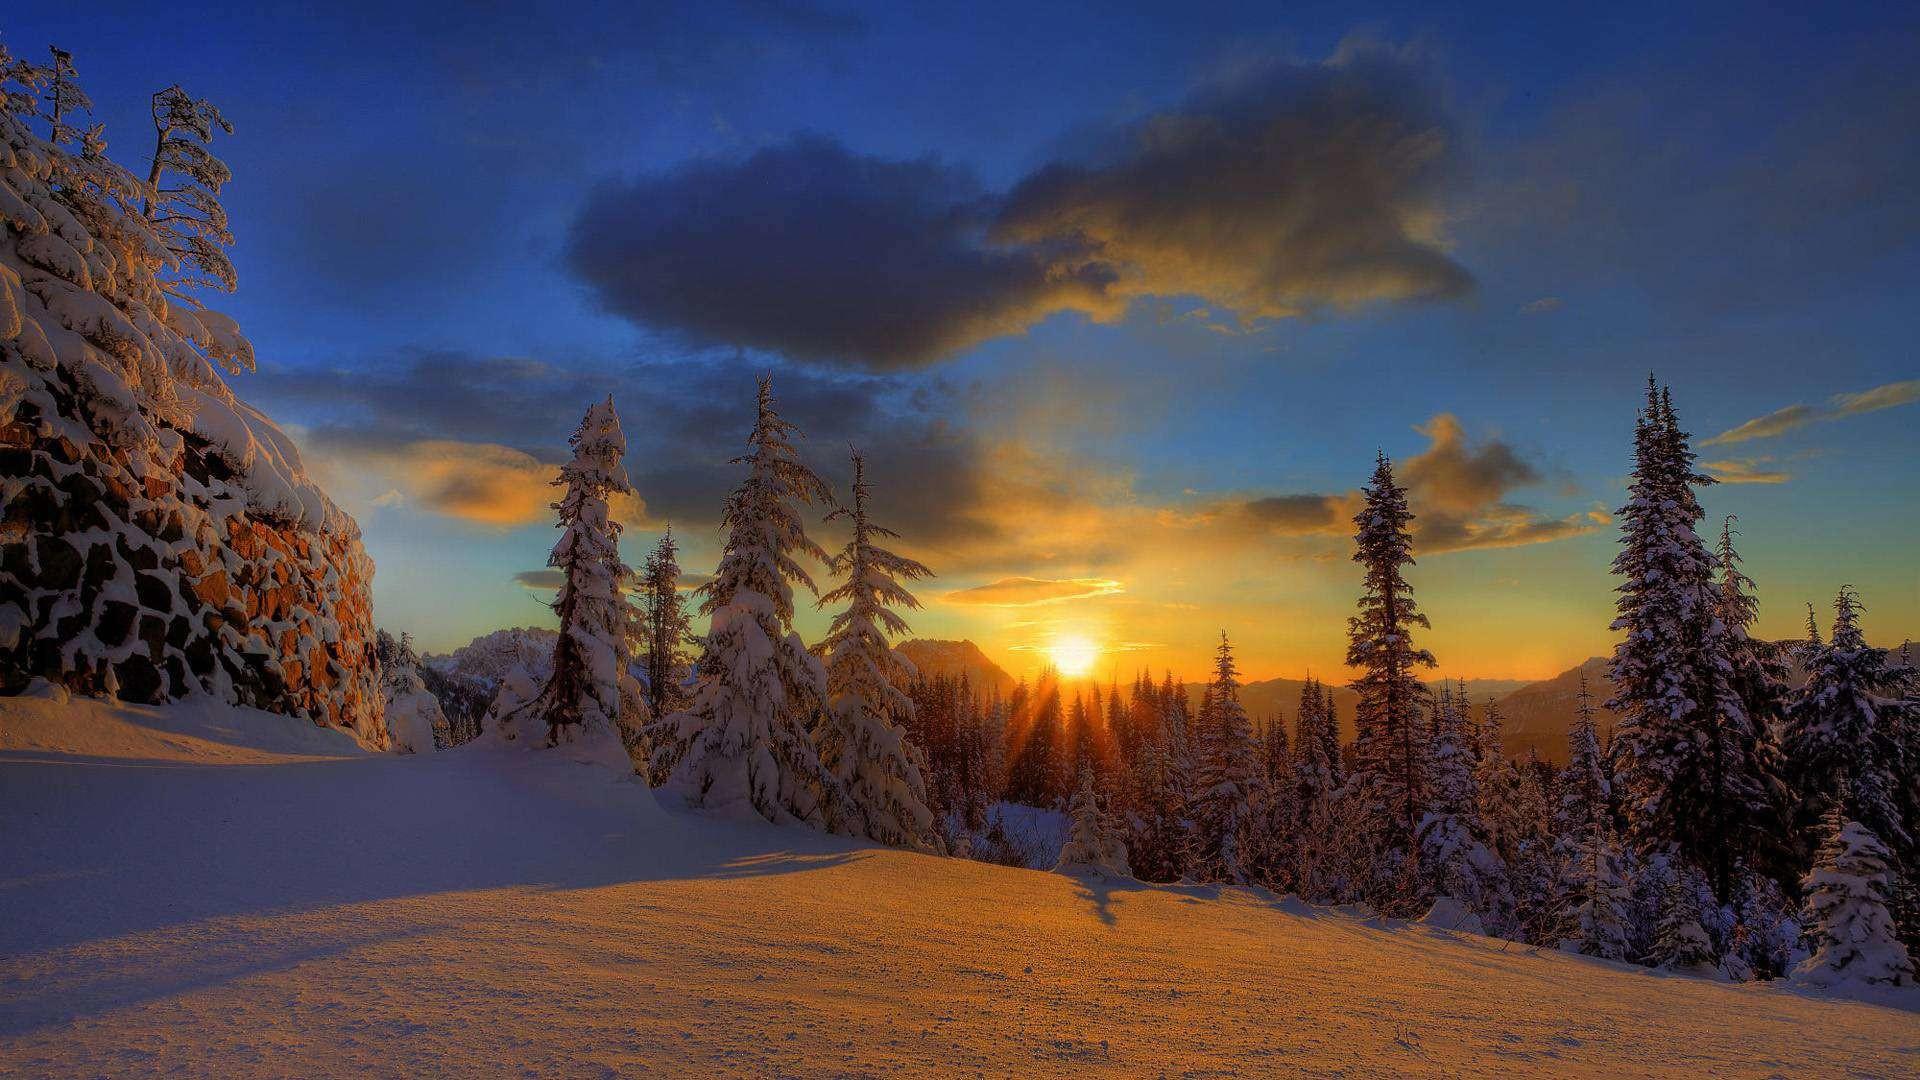 HD Snow Wallpaper (82+ images)